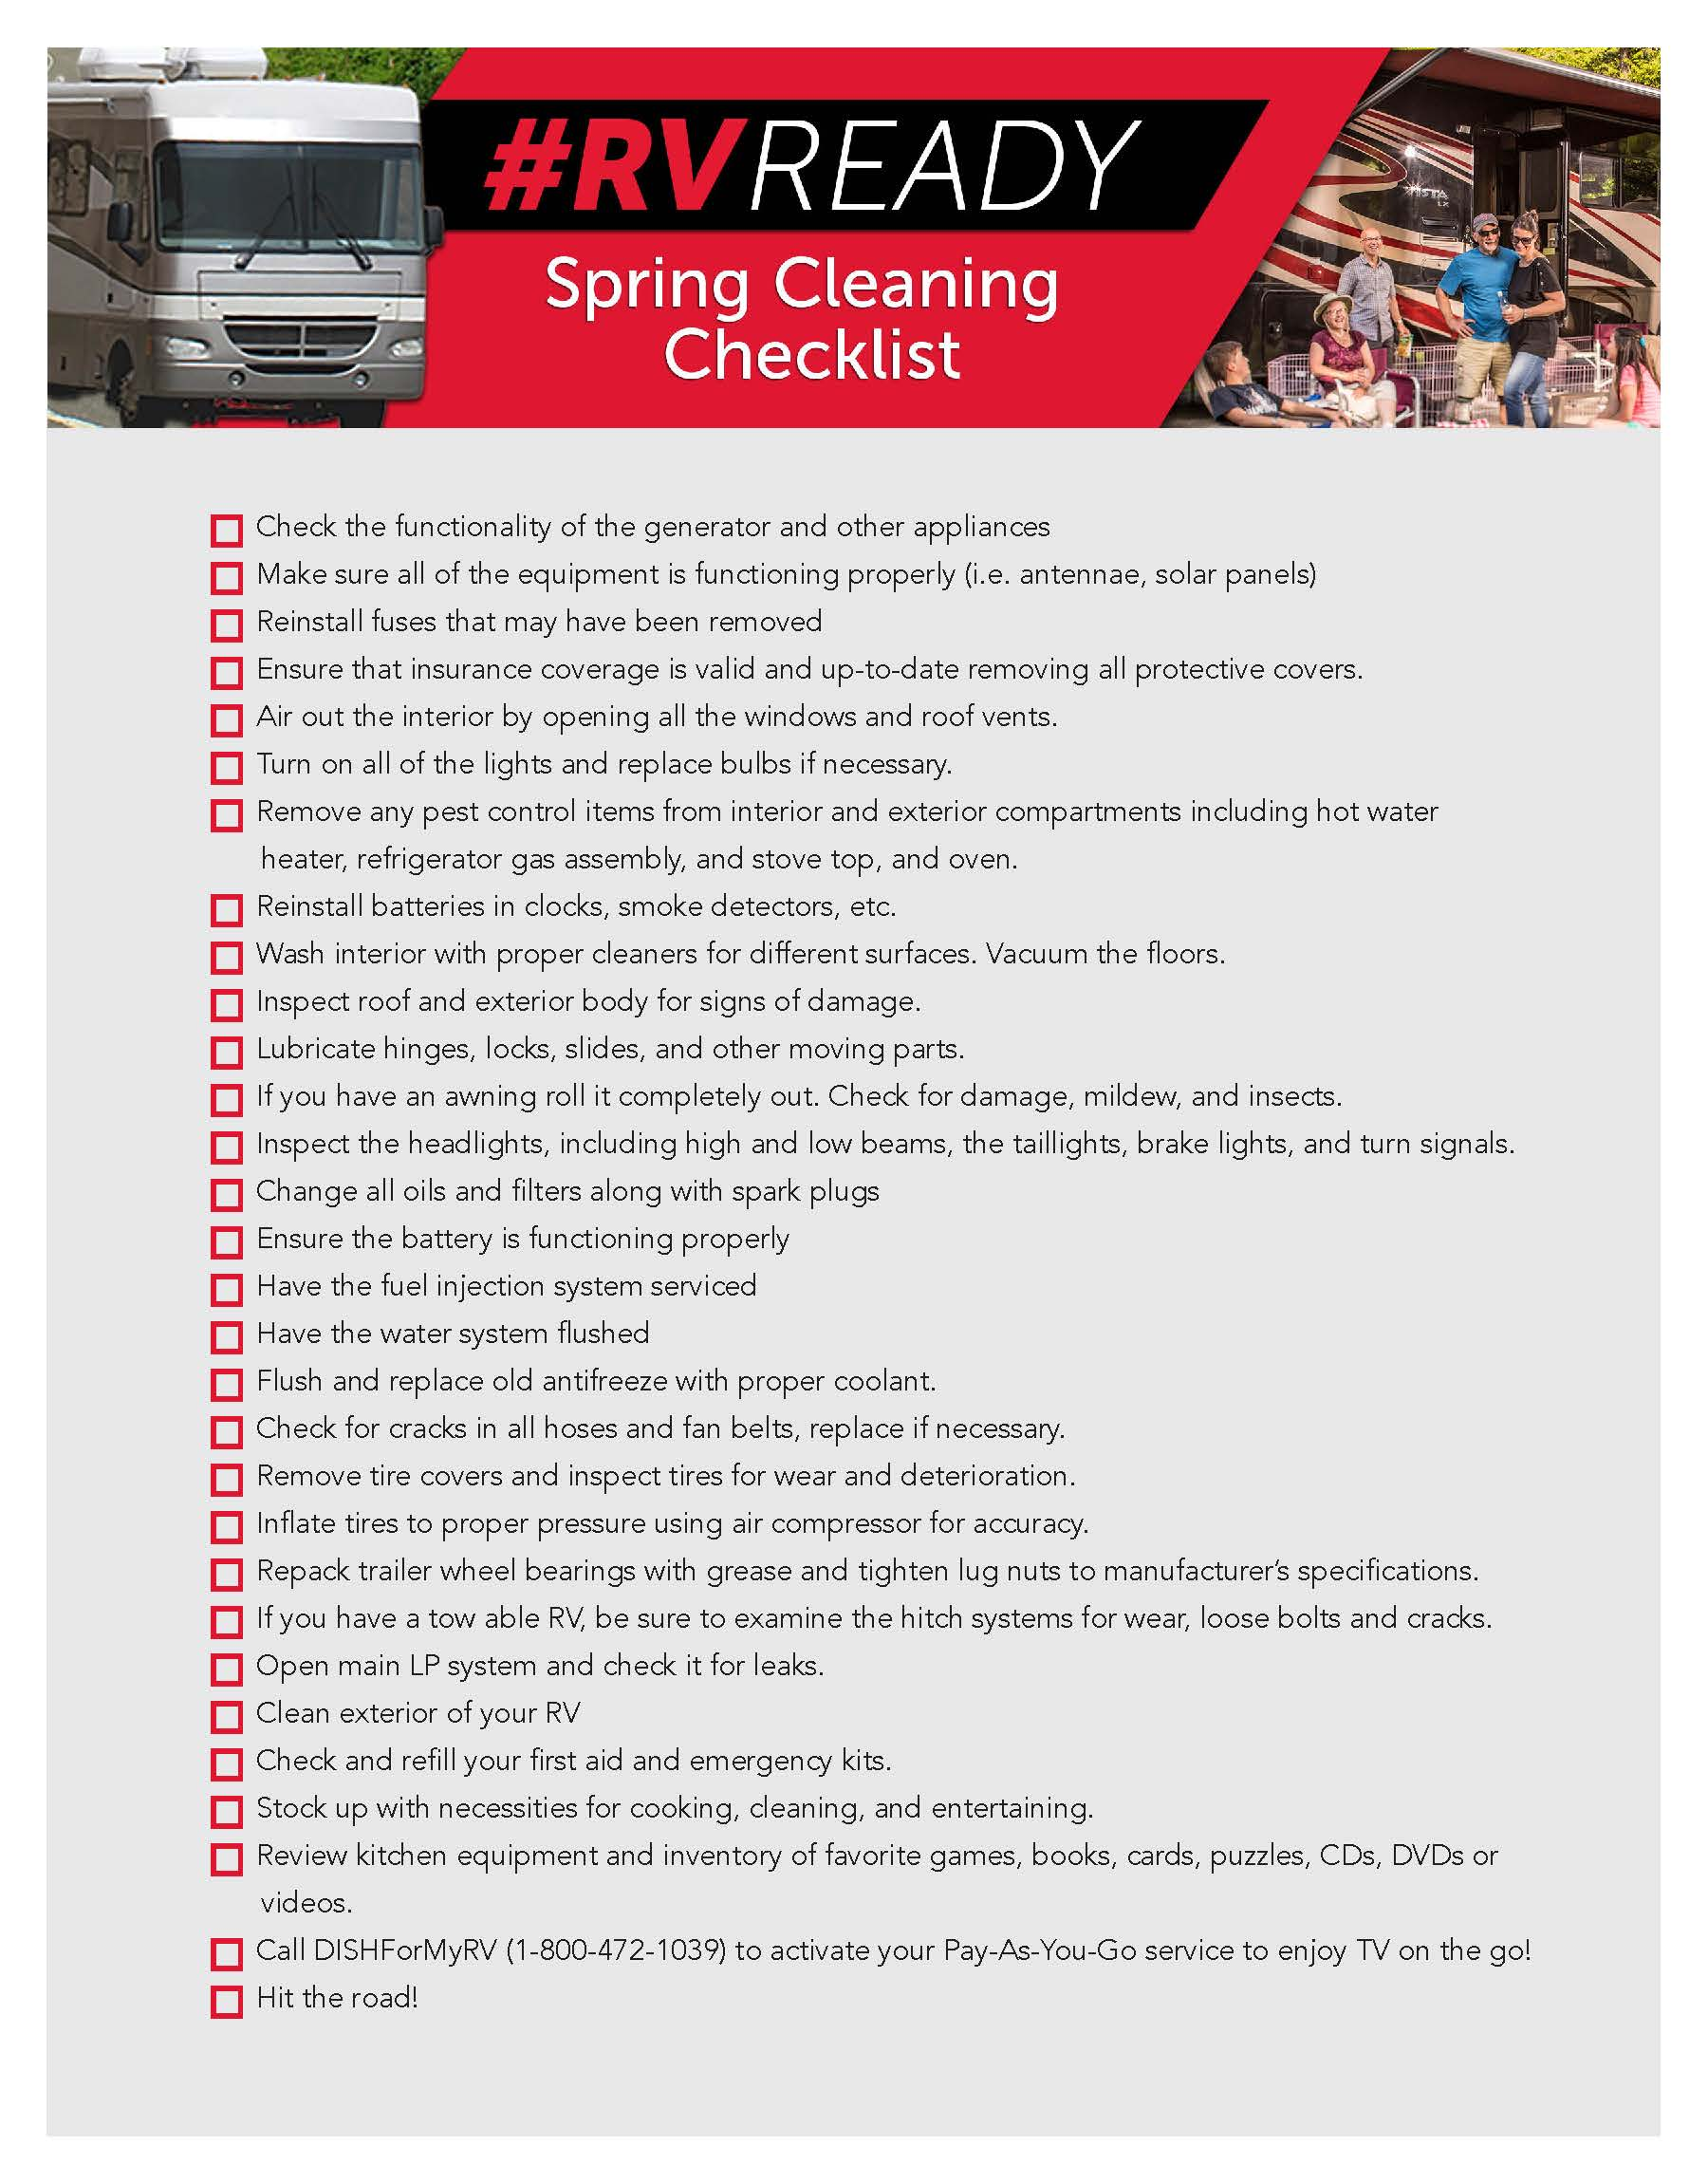 SpringCleaningChecklist.jpg